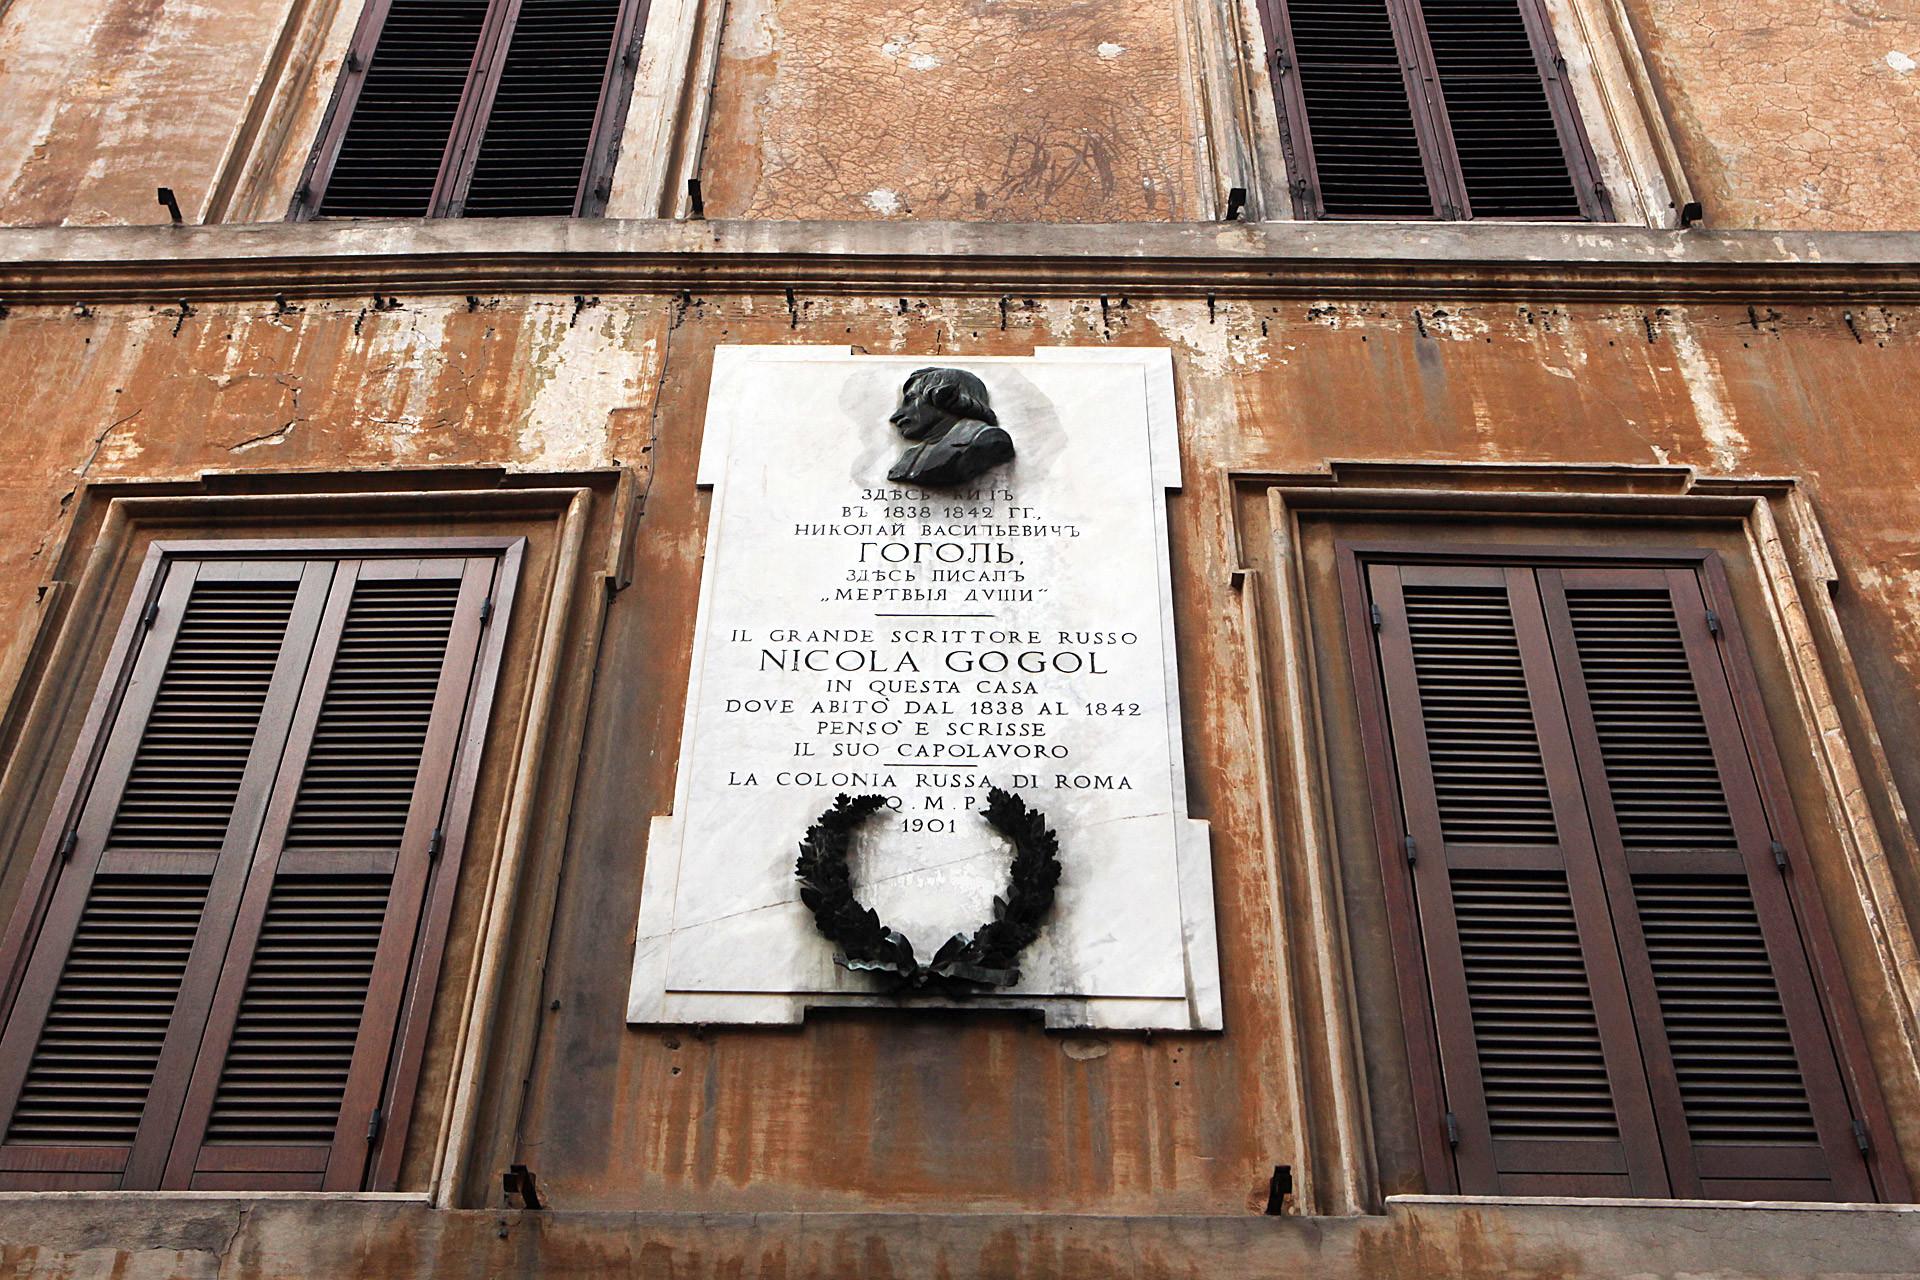 Gedenktafel für Nikolai Gogol in Via Sistina in Rom